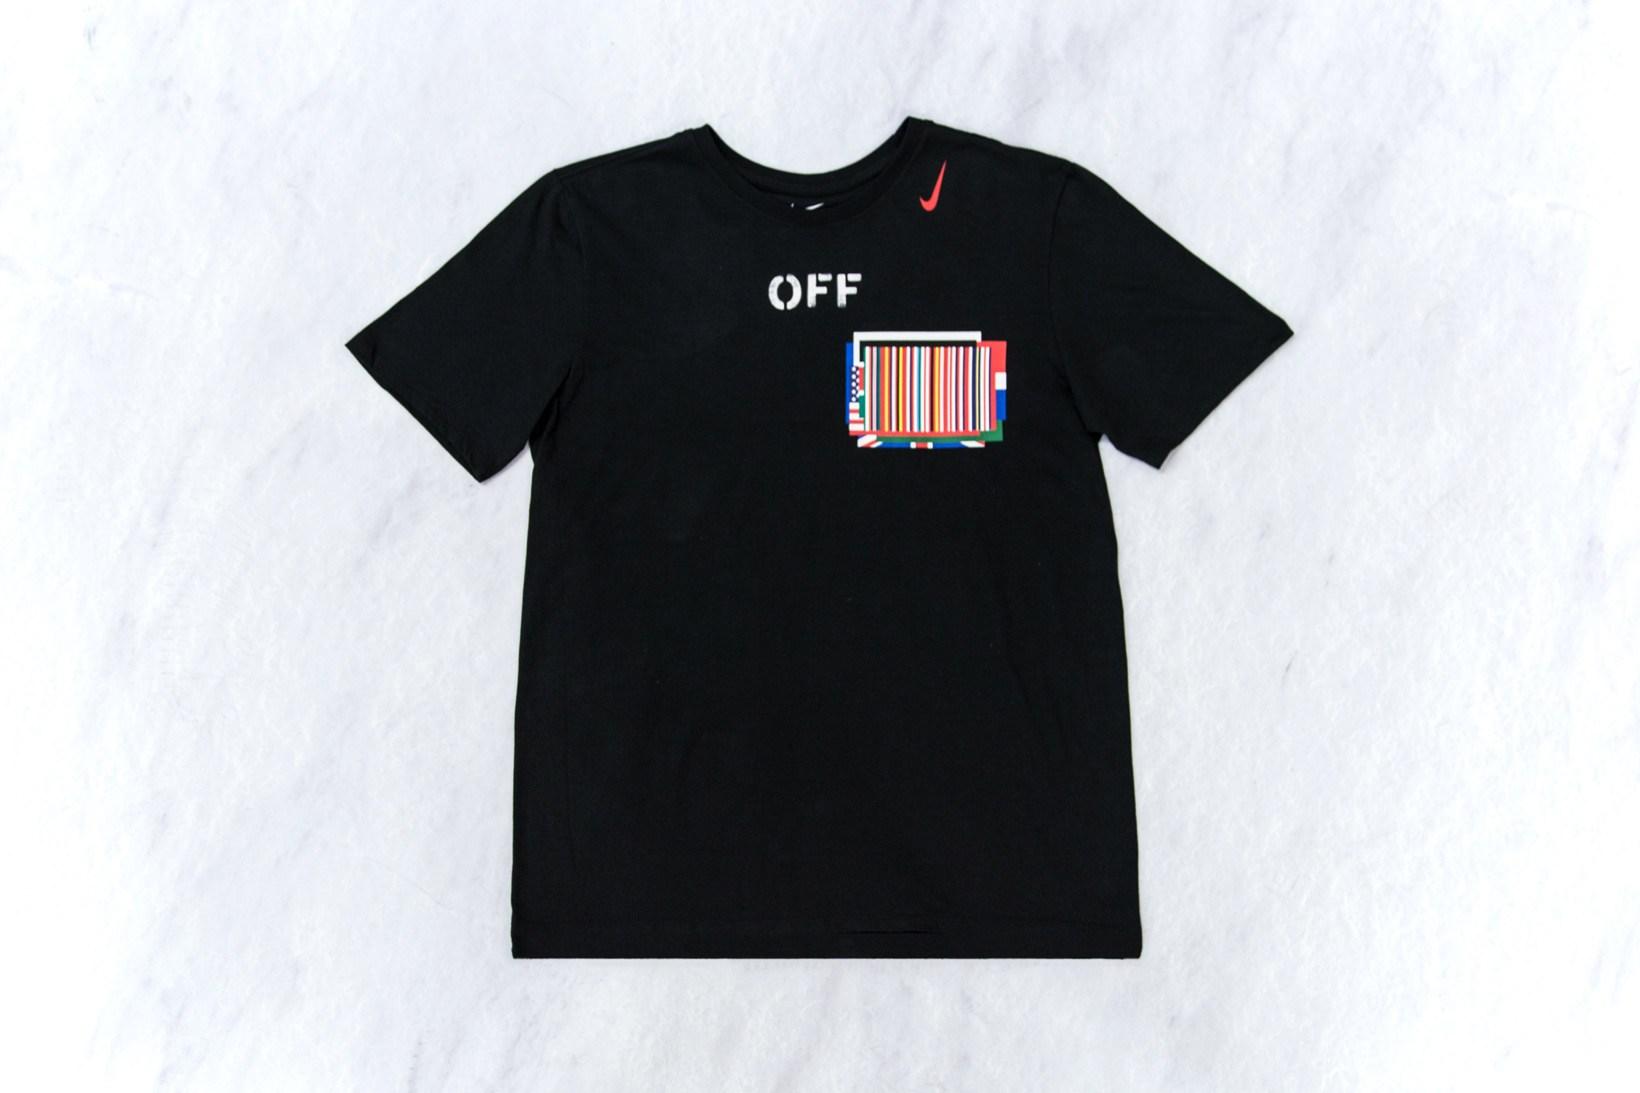 nike-off-white-virgil-abloh-equality-t-shirt-4